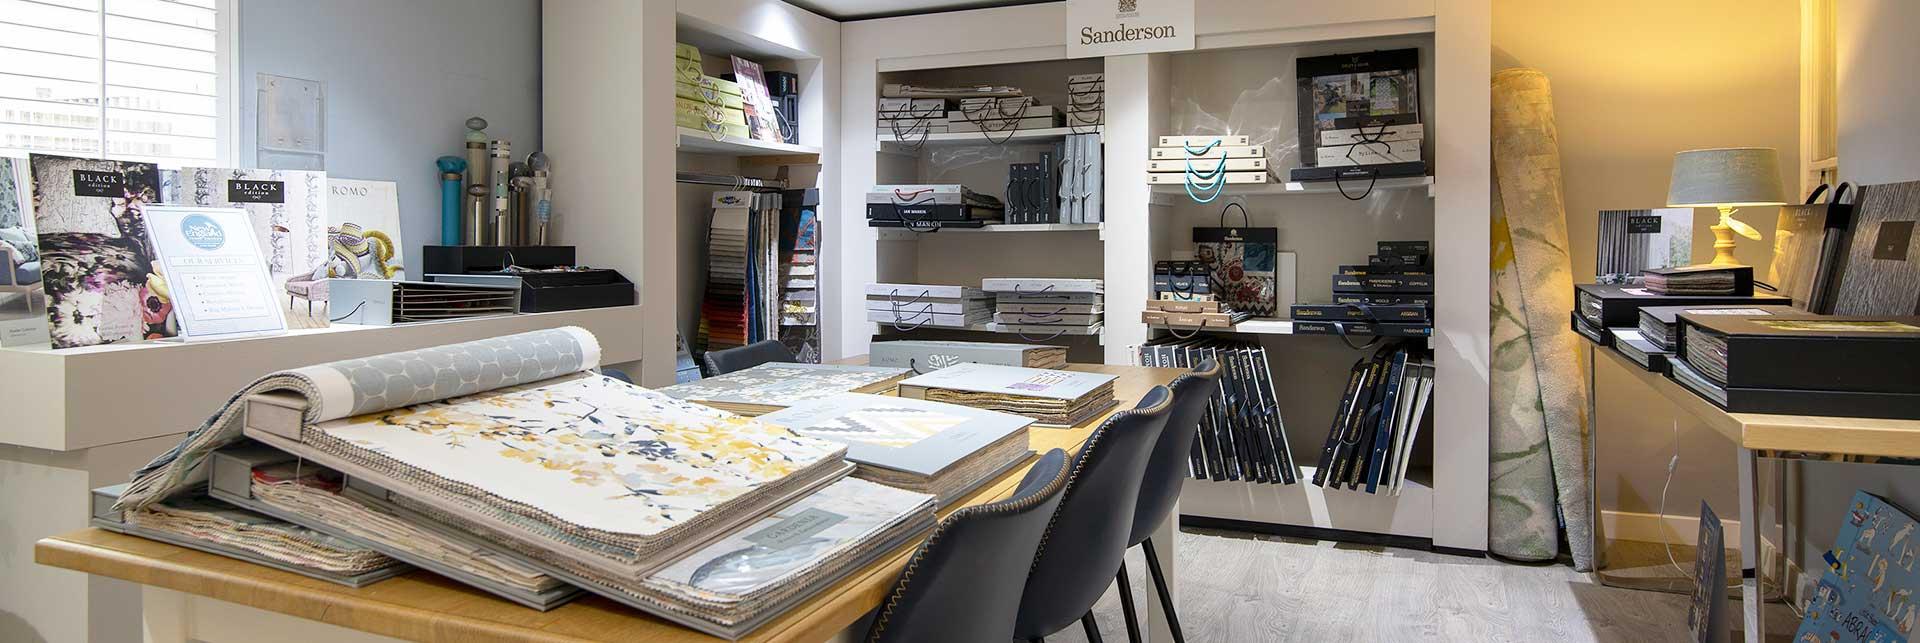 New England Home Interiors design studio in Horsham